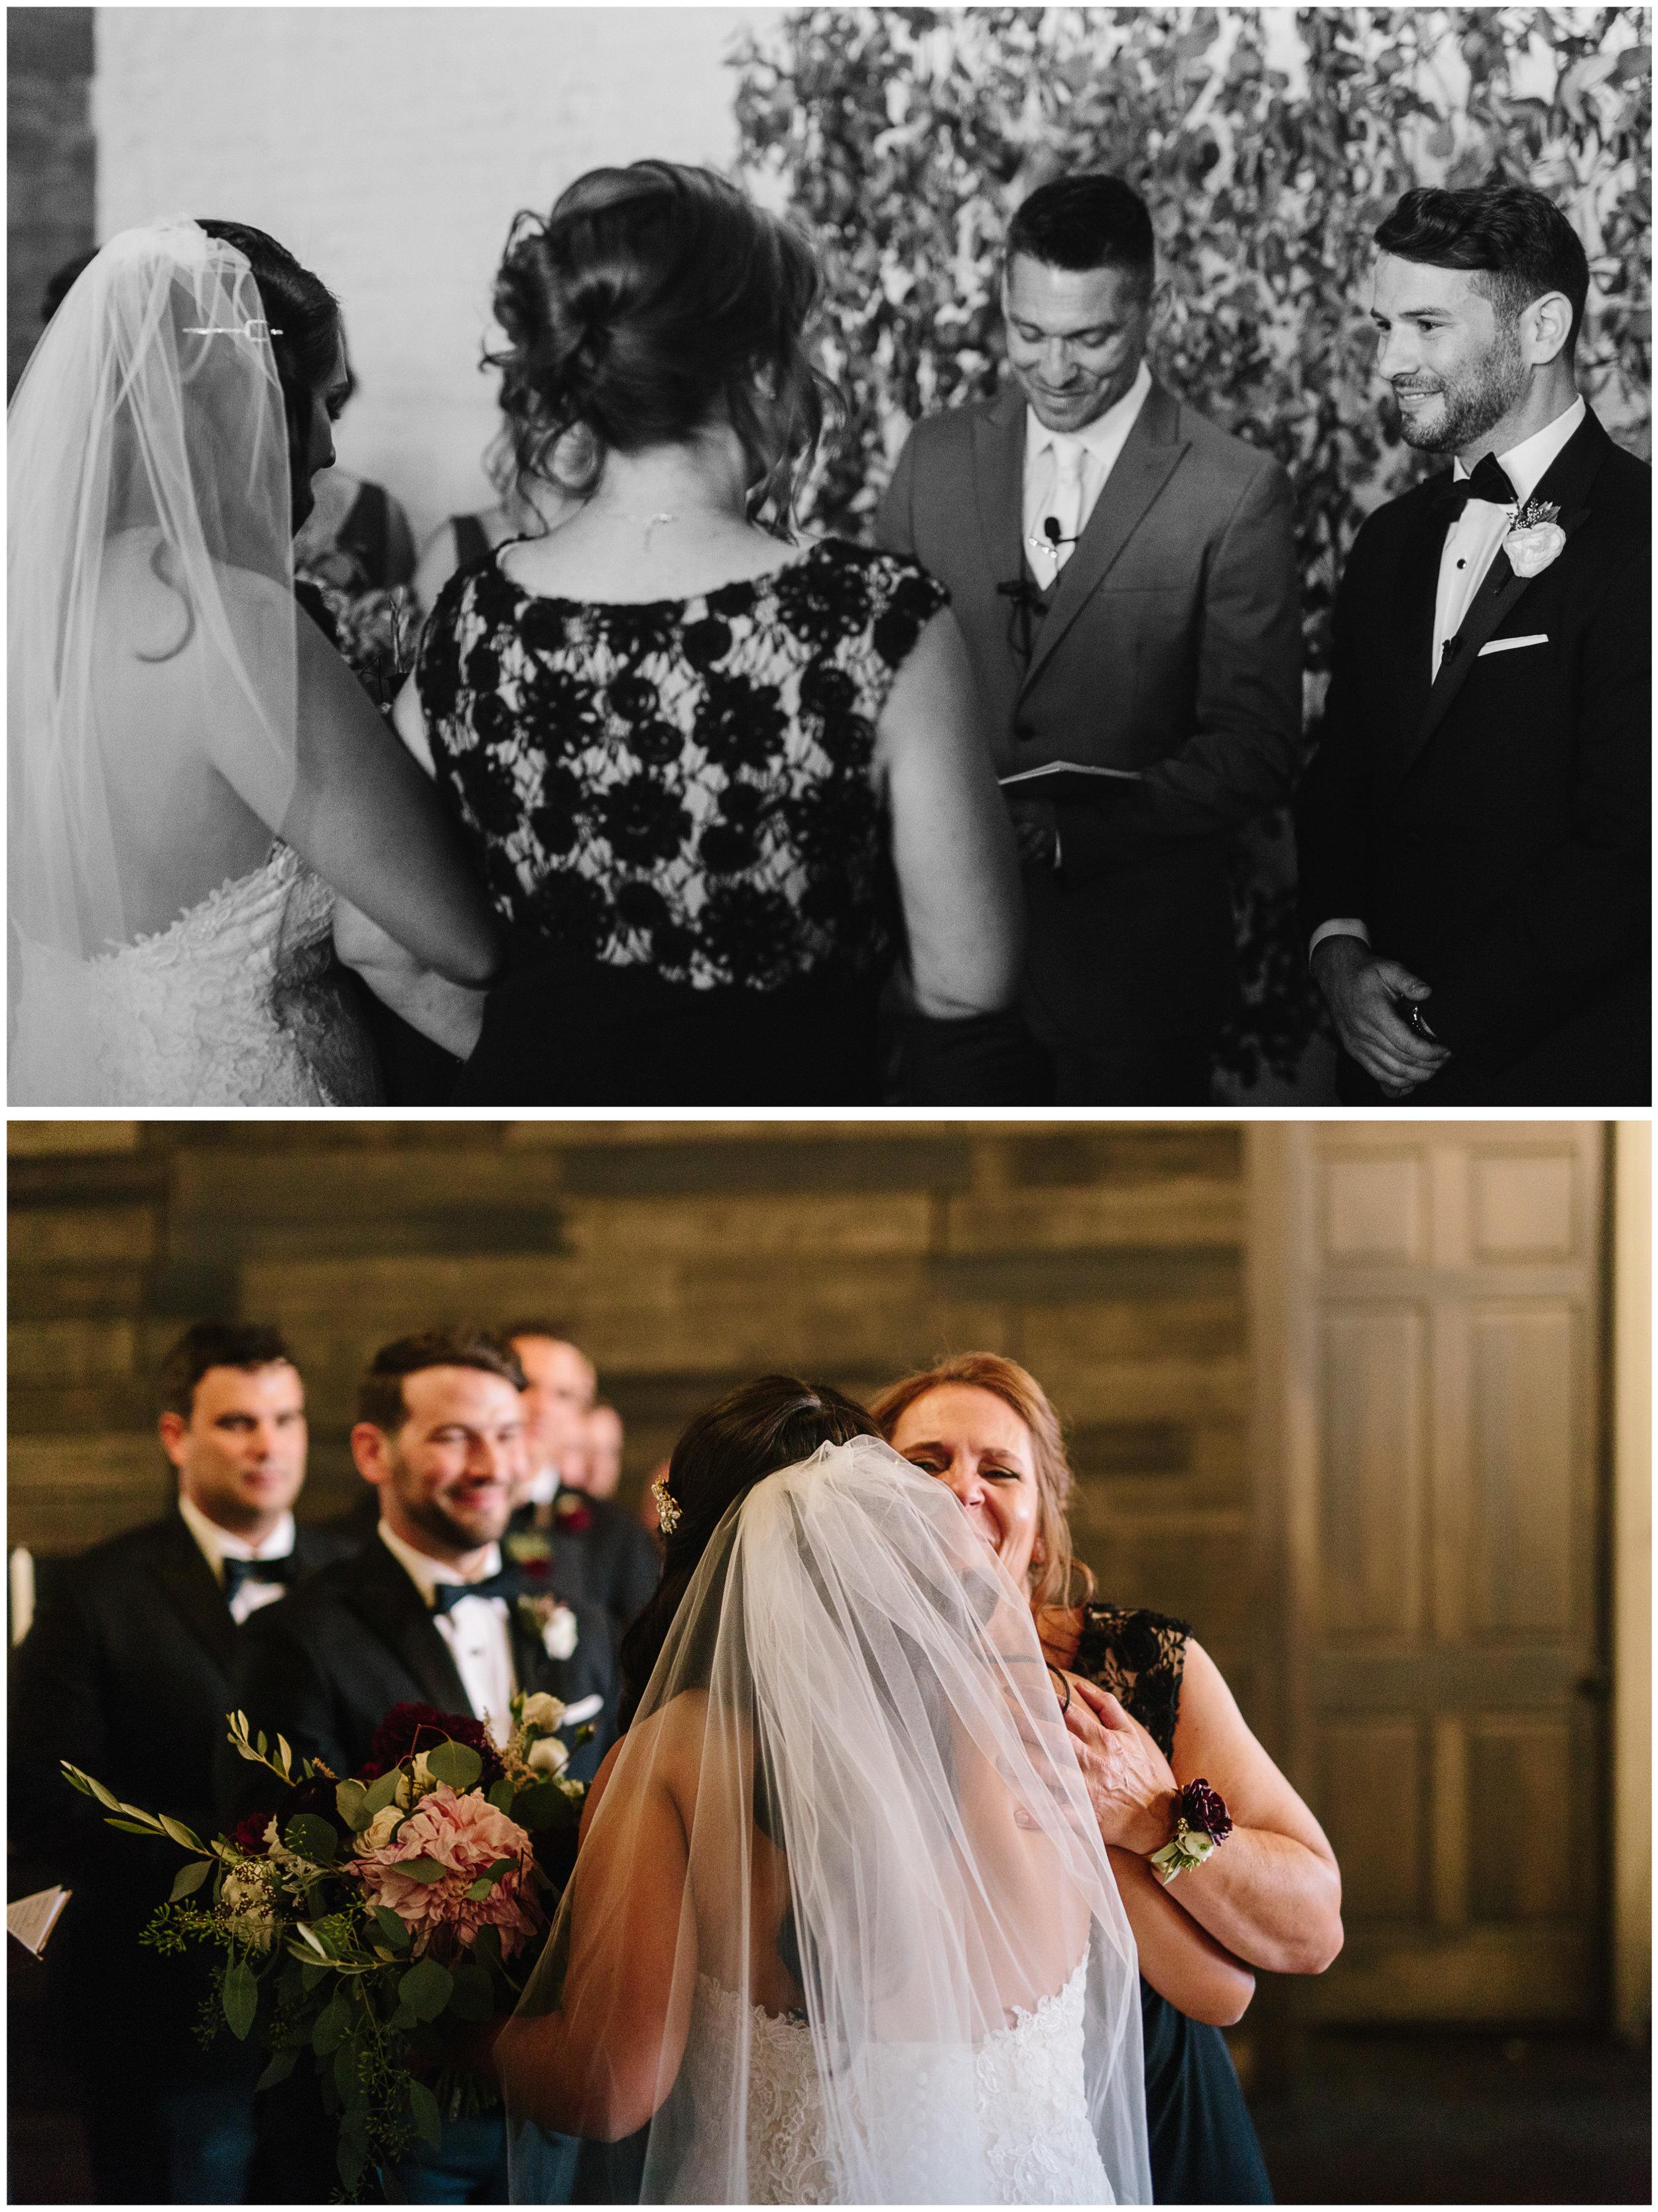 moss_denver_wedding_49.jpg